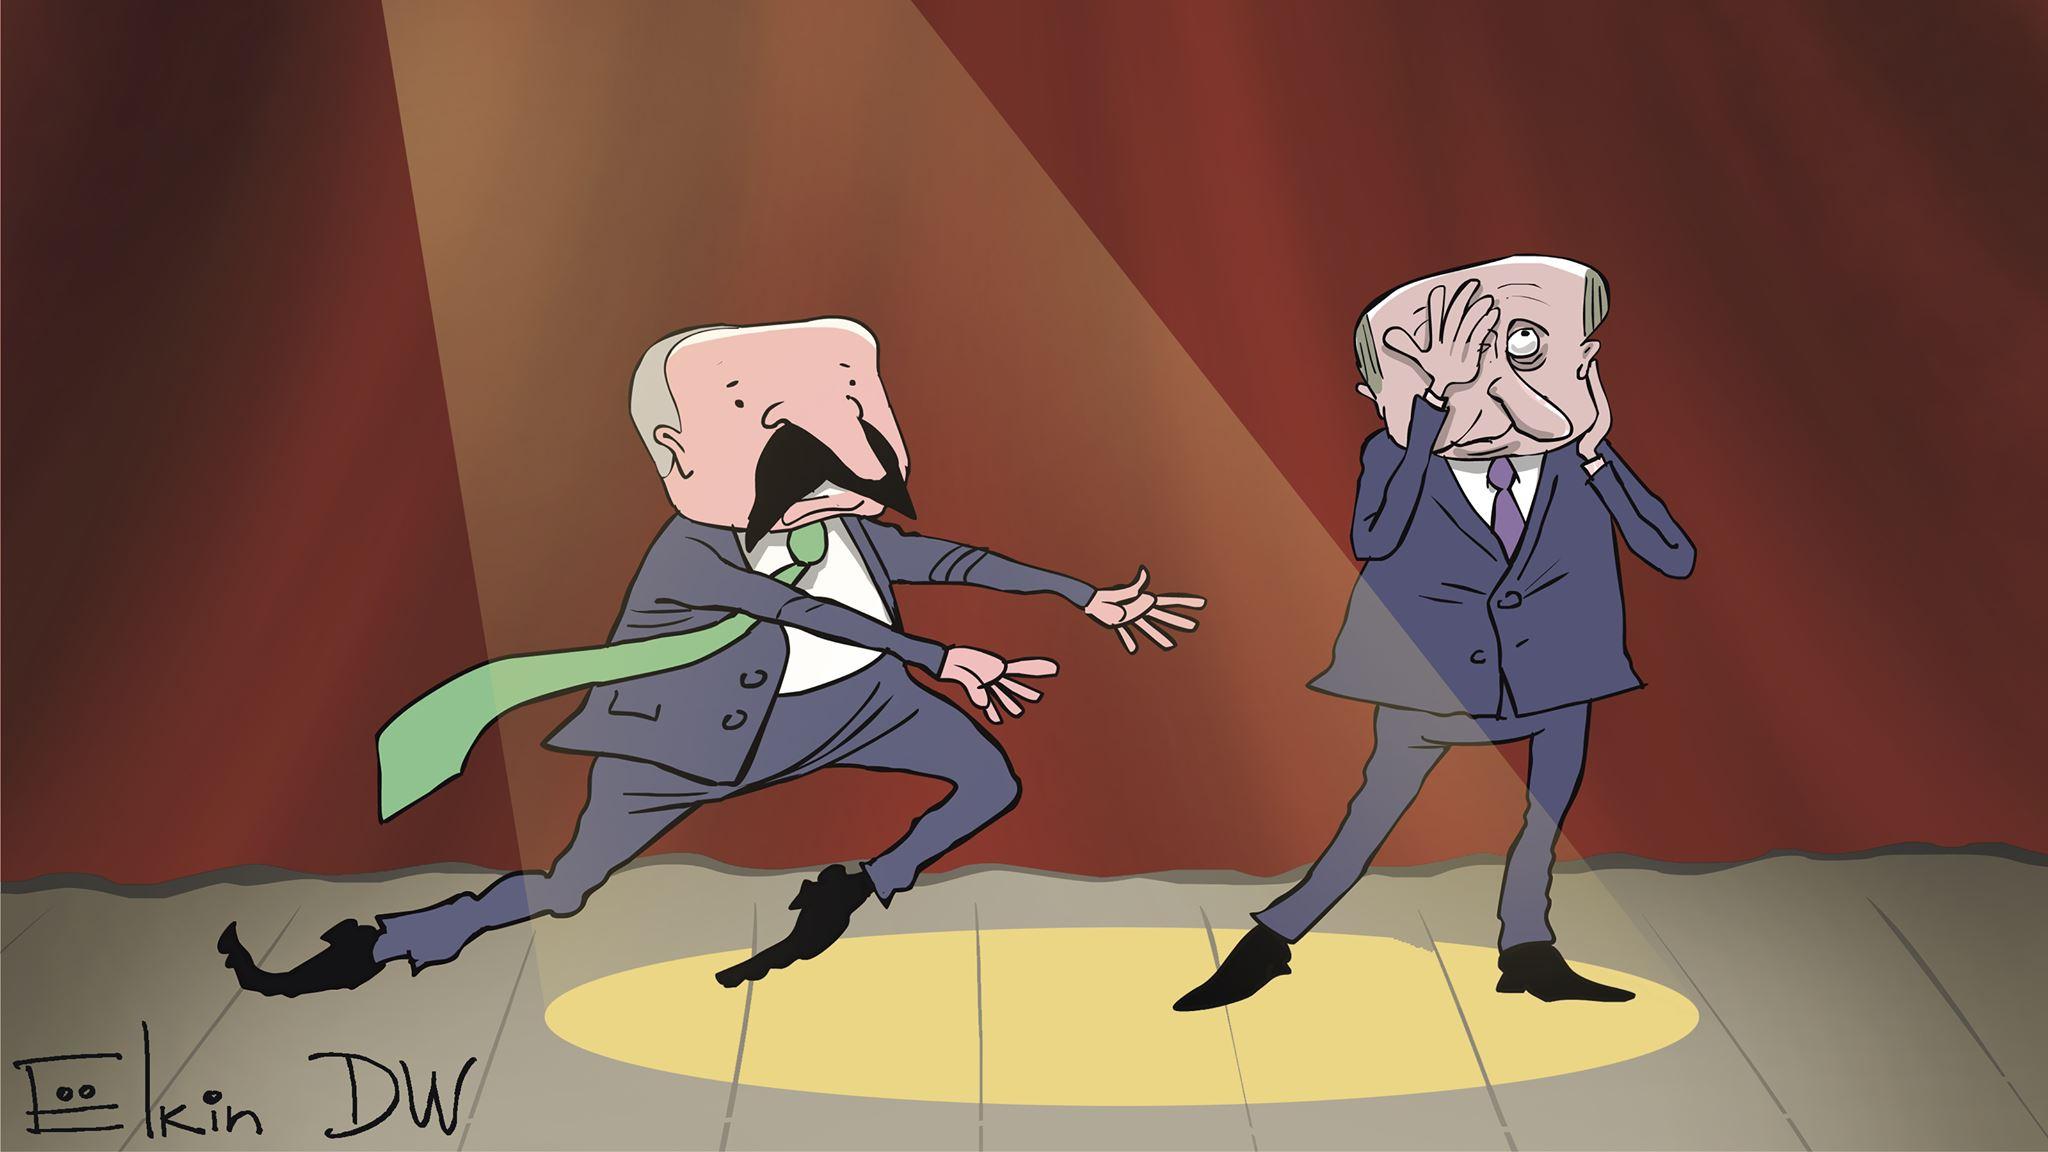 «Послал бы я тебя с удовольствием, но не могу»: Двозначні жести Путіна та Лукашенка на переговорах